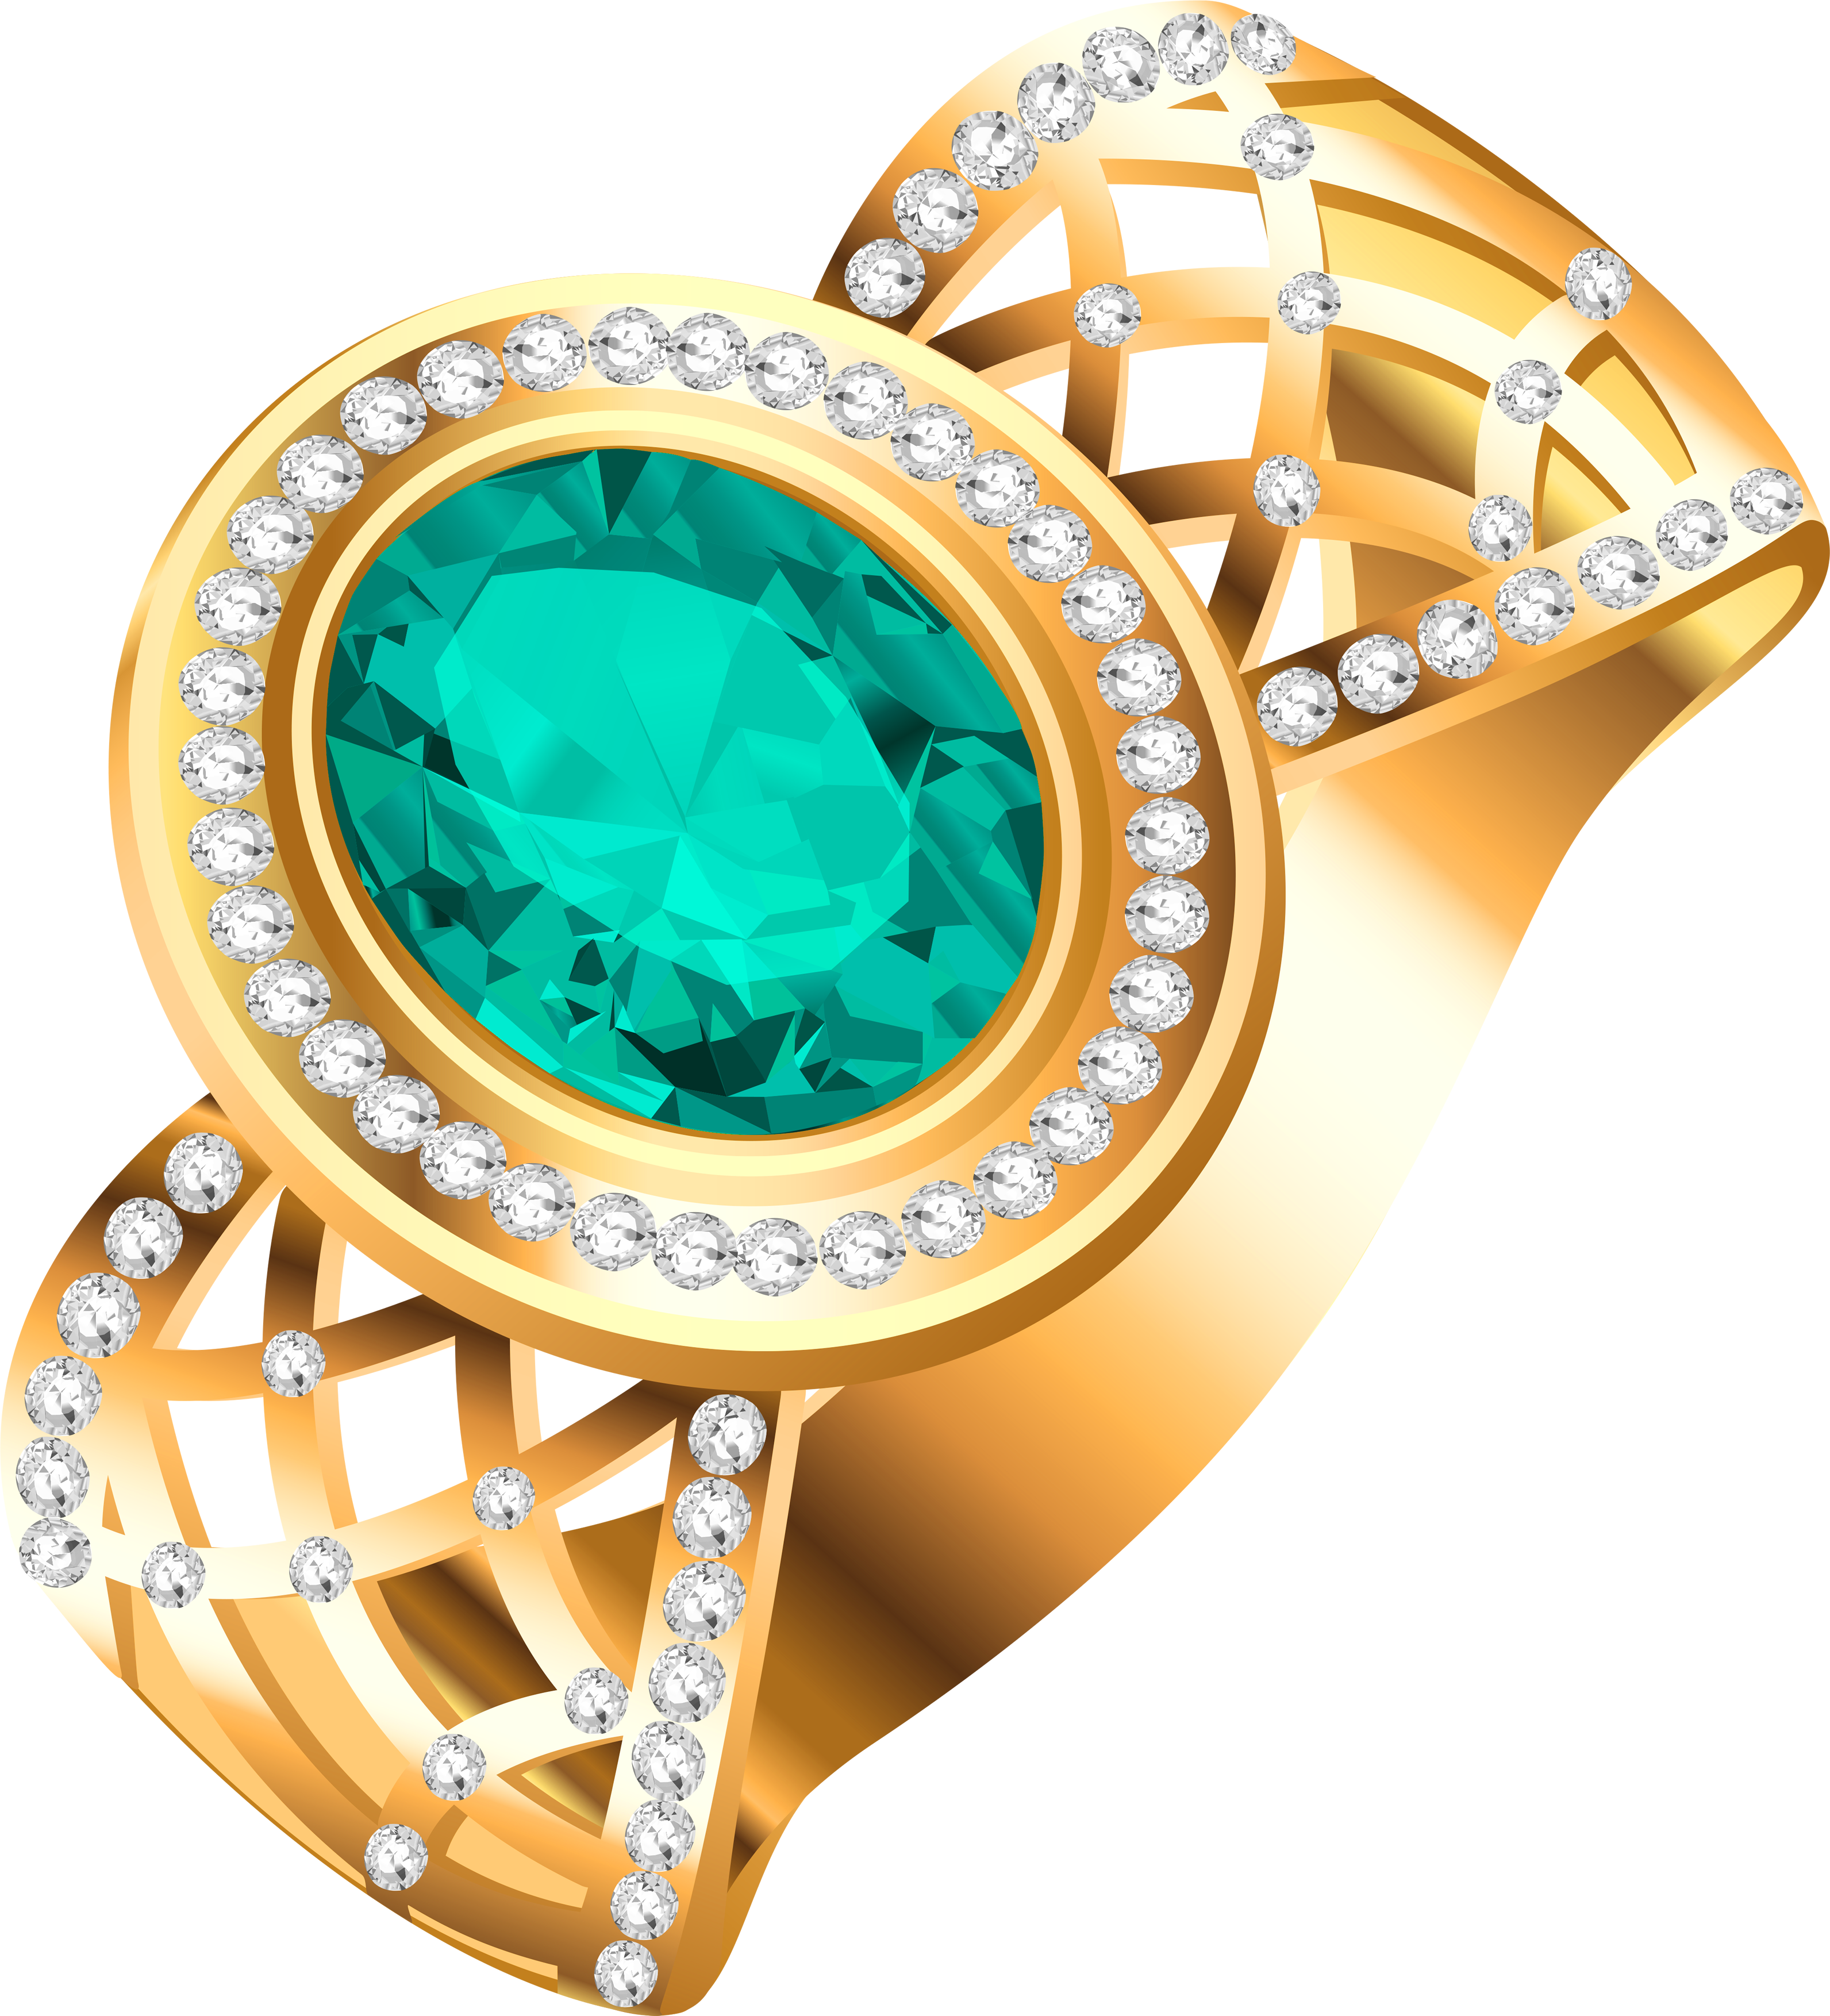 Diamond Rings With Emerald